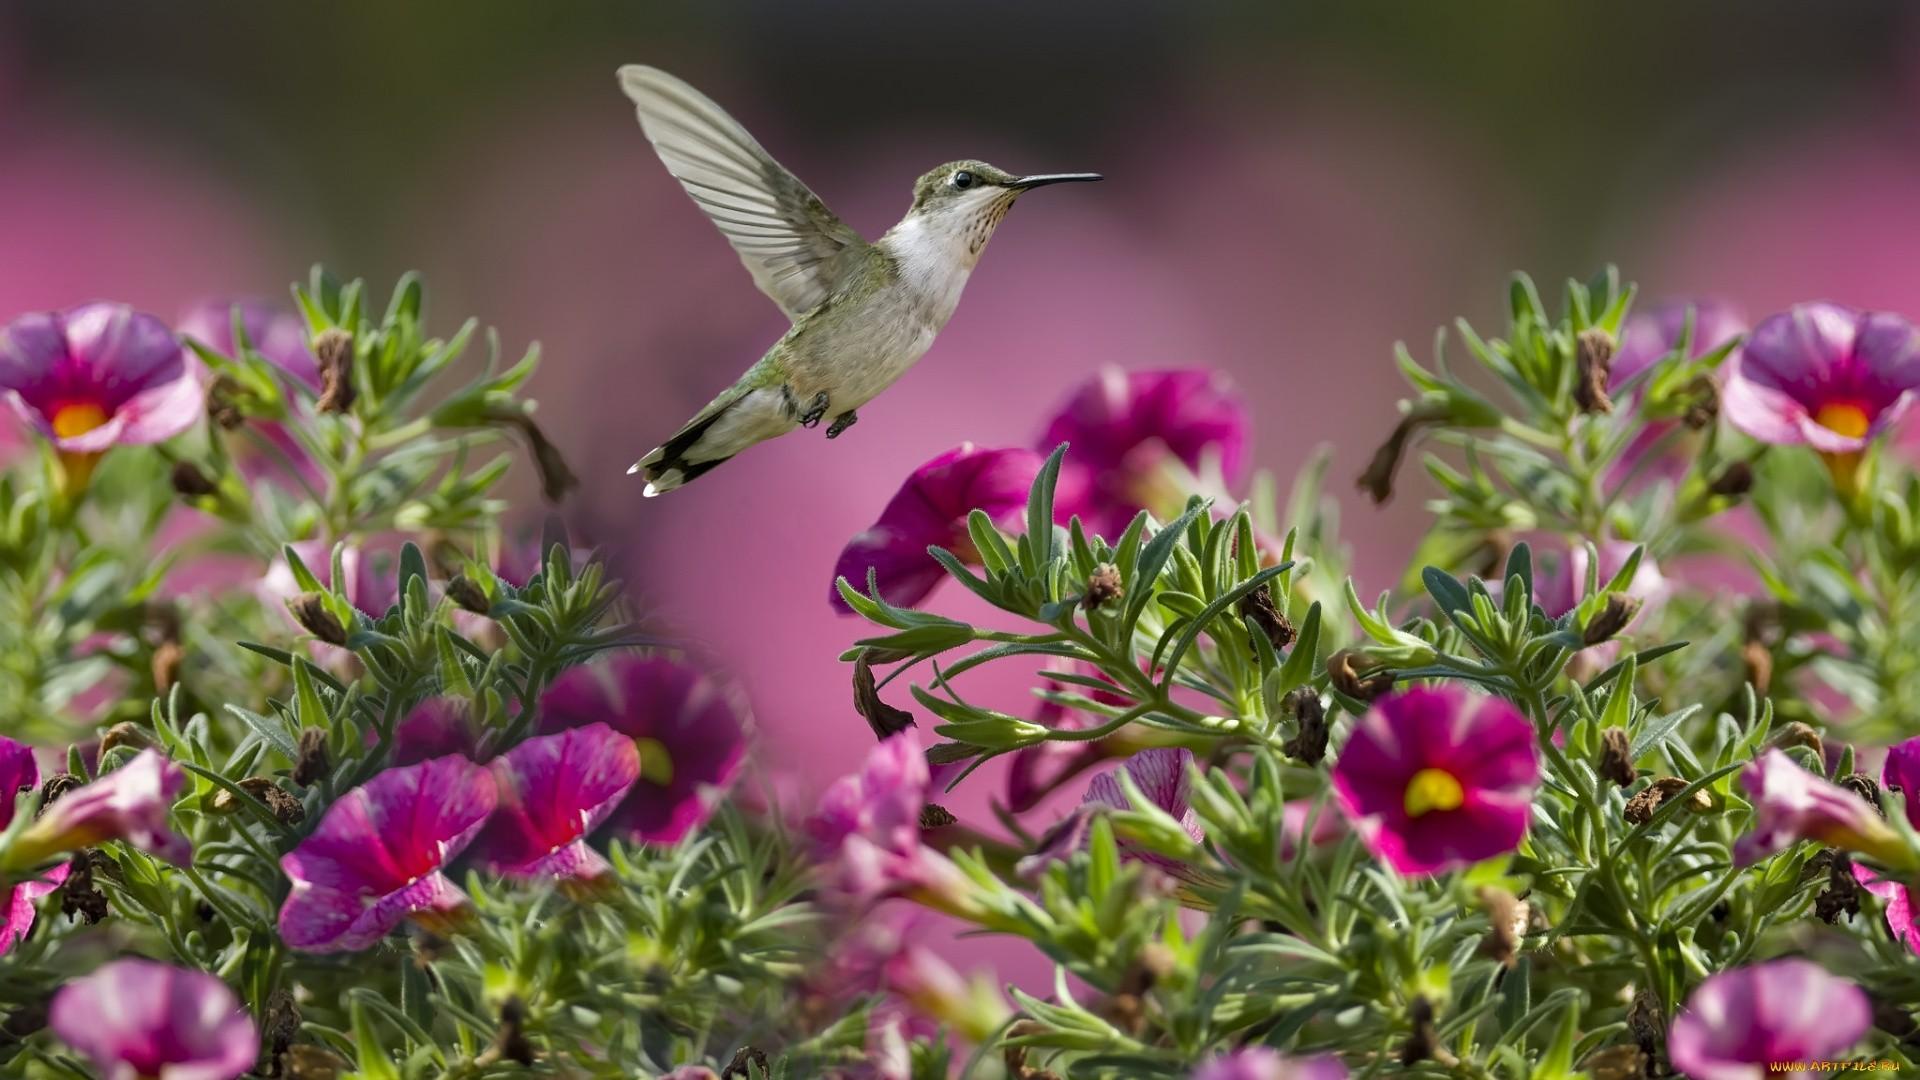 Hummingbird Wallpaper theme